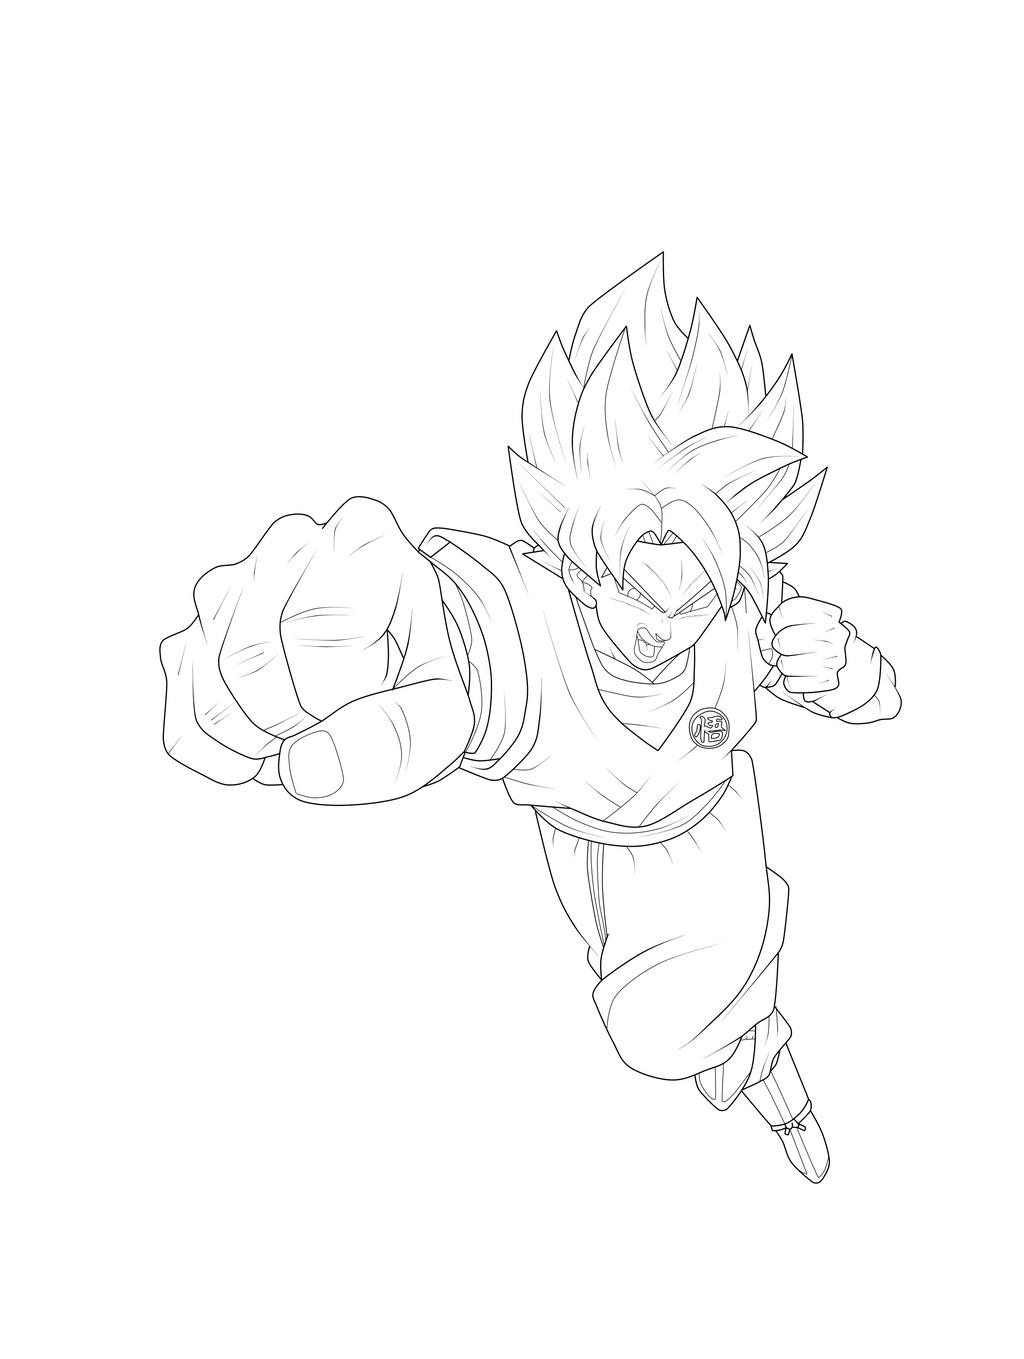 Goku Super Saiyan Blue Kaioken X10 Lineart by Frost-Z on ...